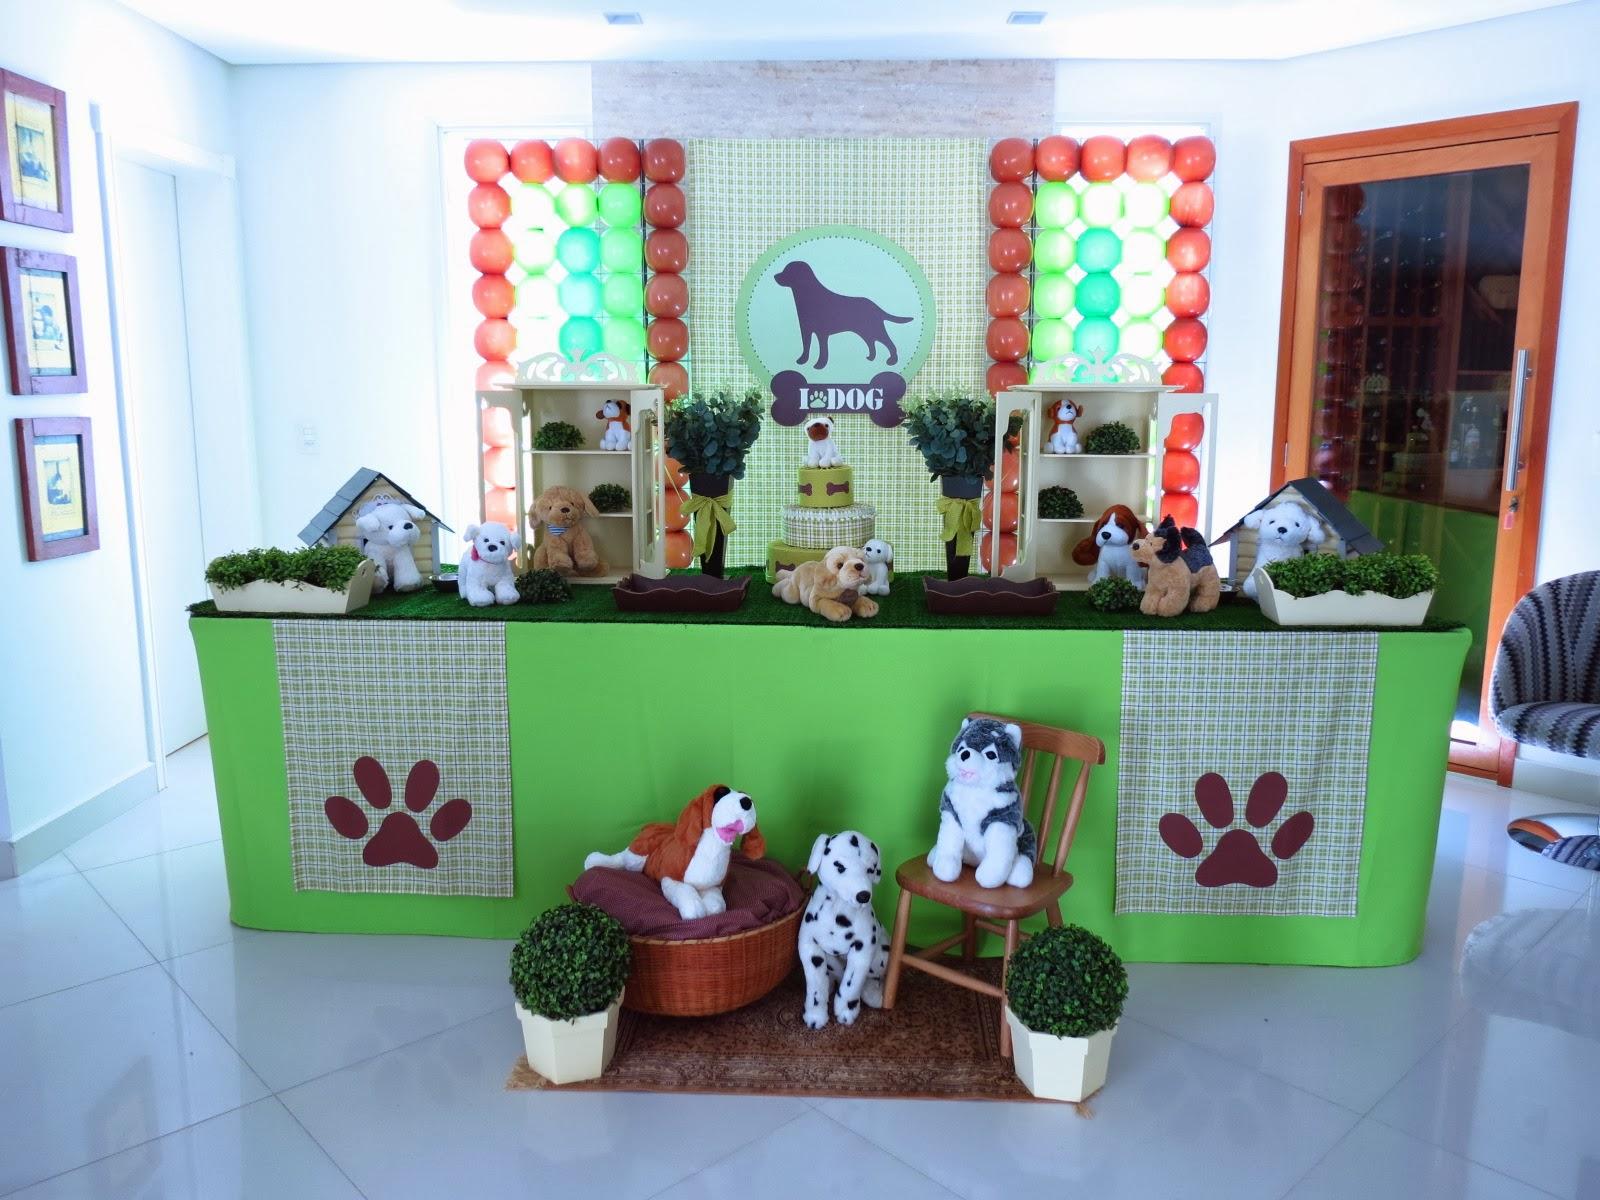 http://farolitadecoracoes.blogspot.com.br/search/label/cachorrinhos%20menino